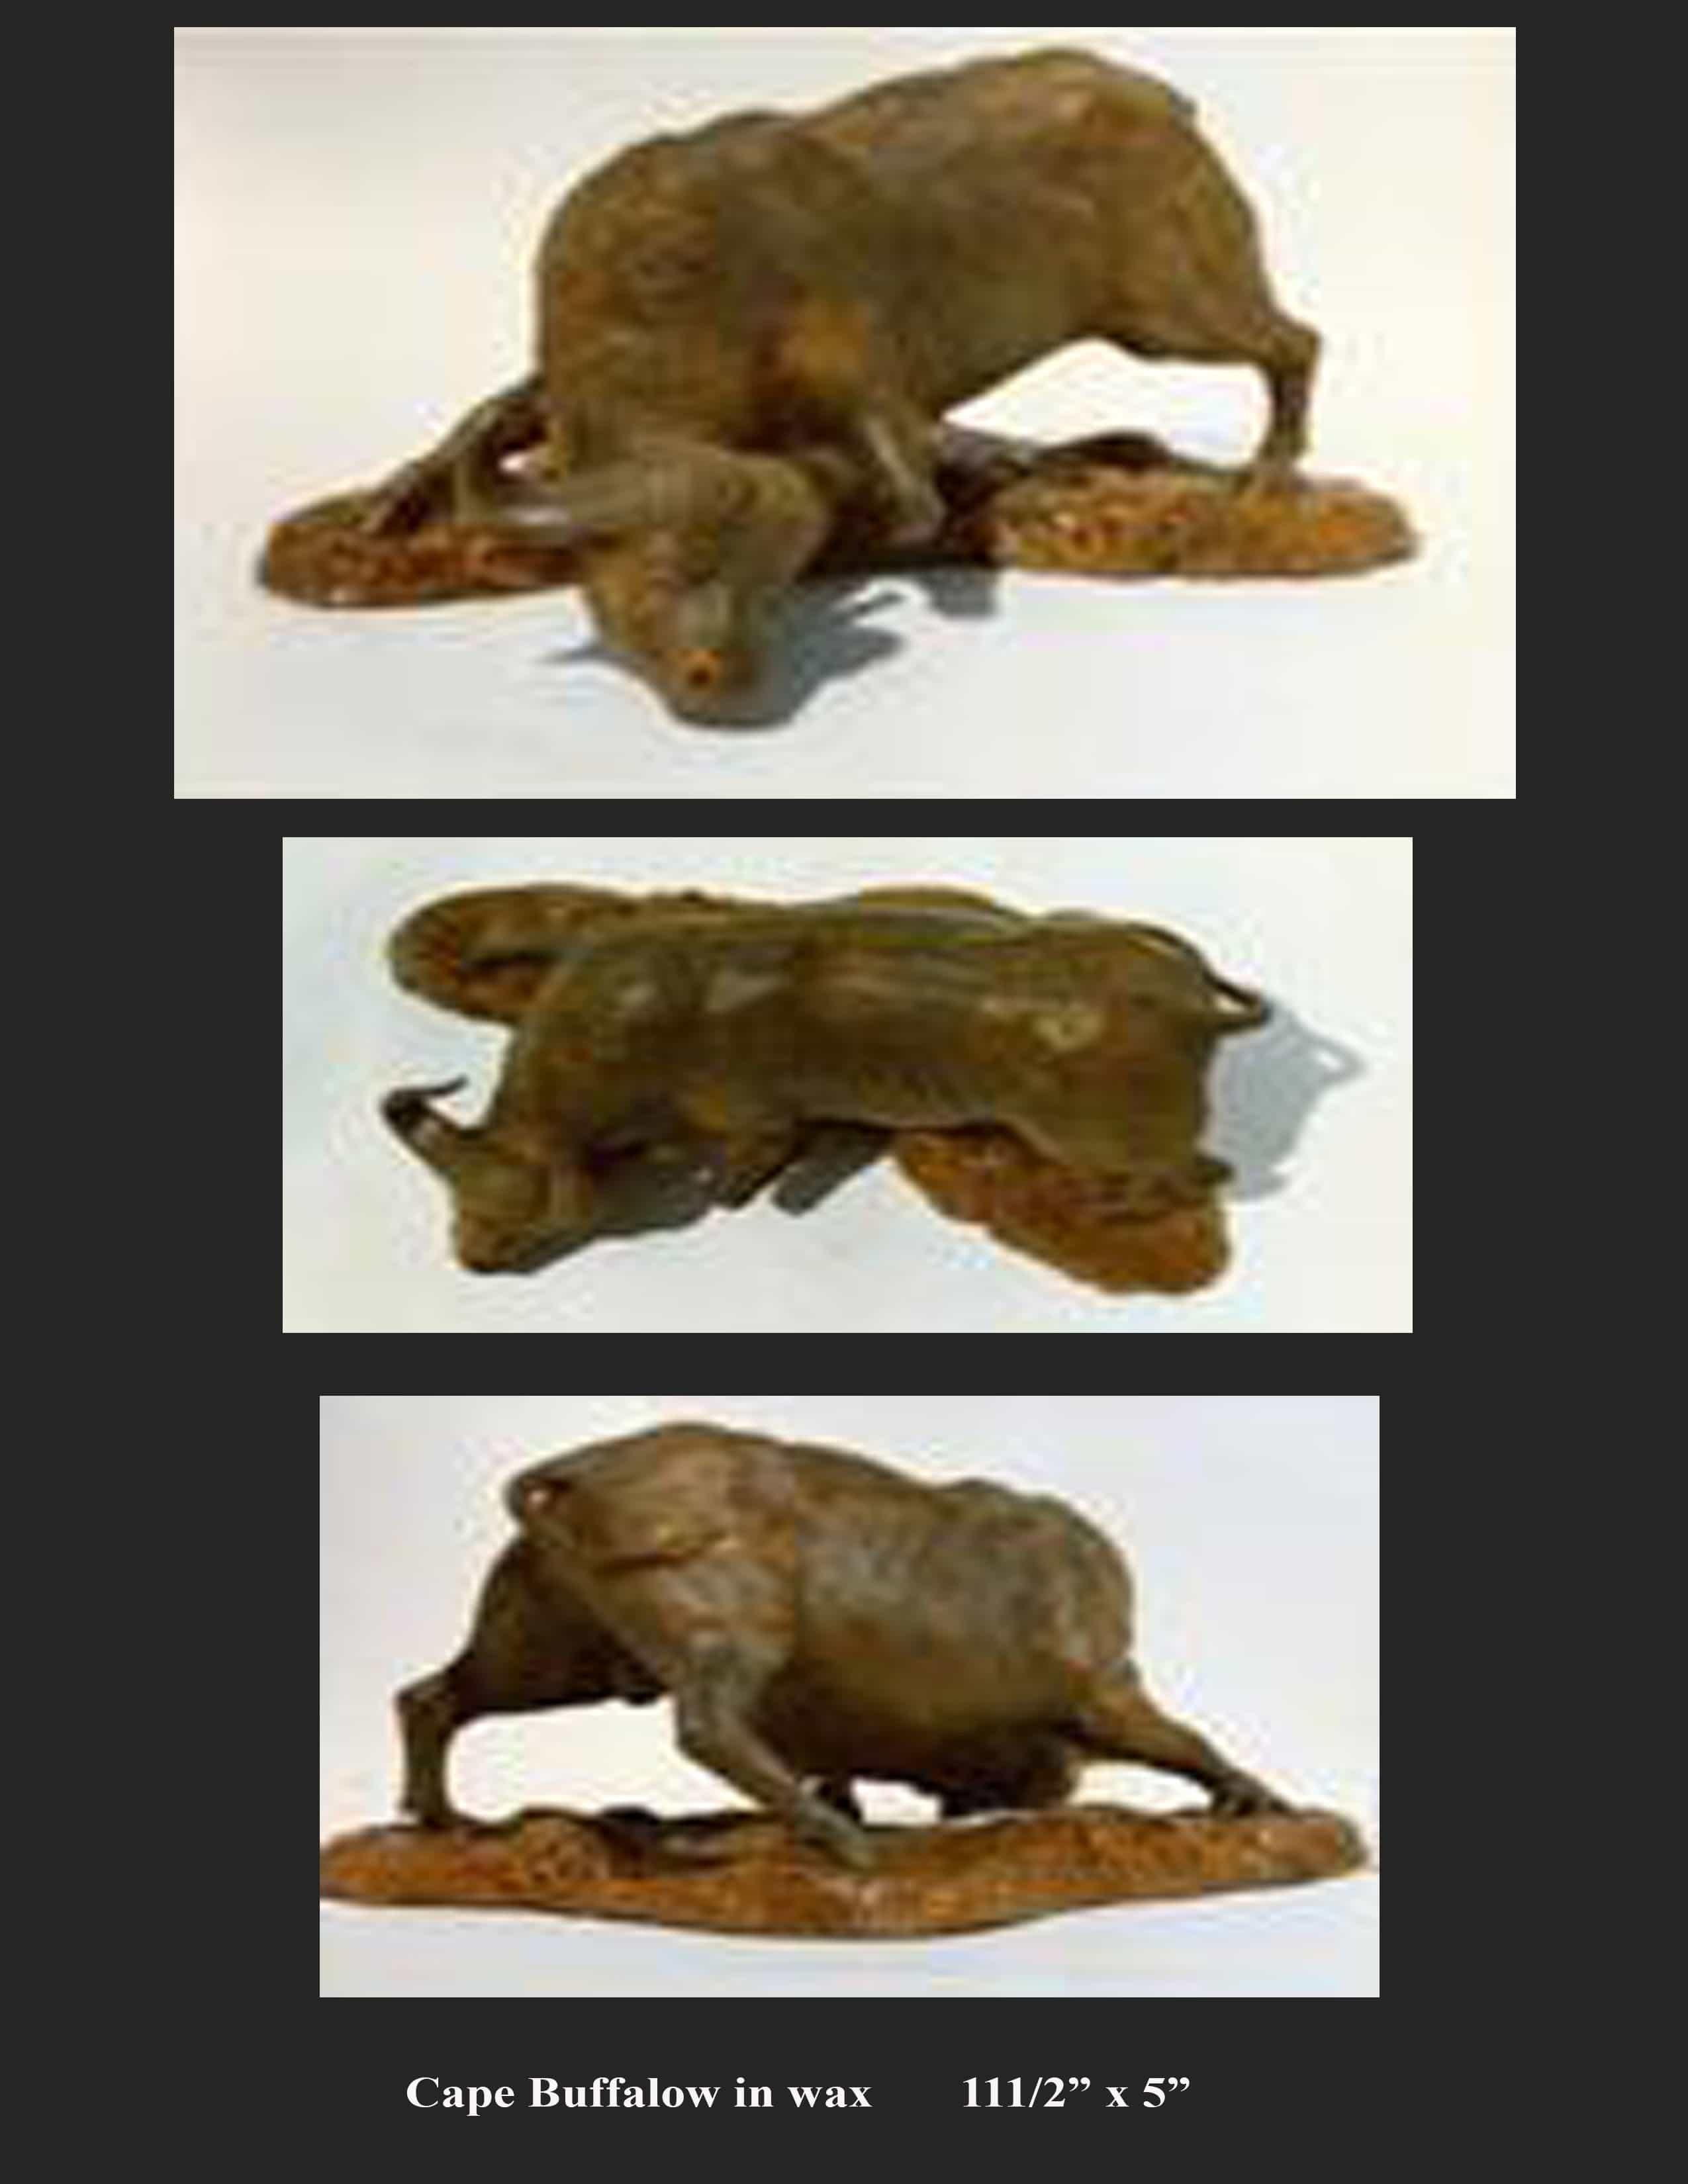 Cape Buffalo - Commissioned Wax Model Image